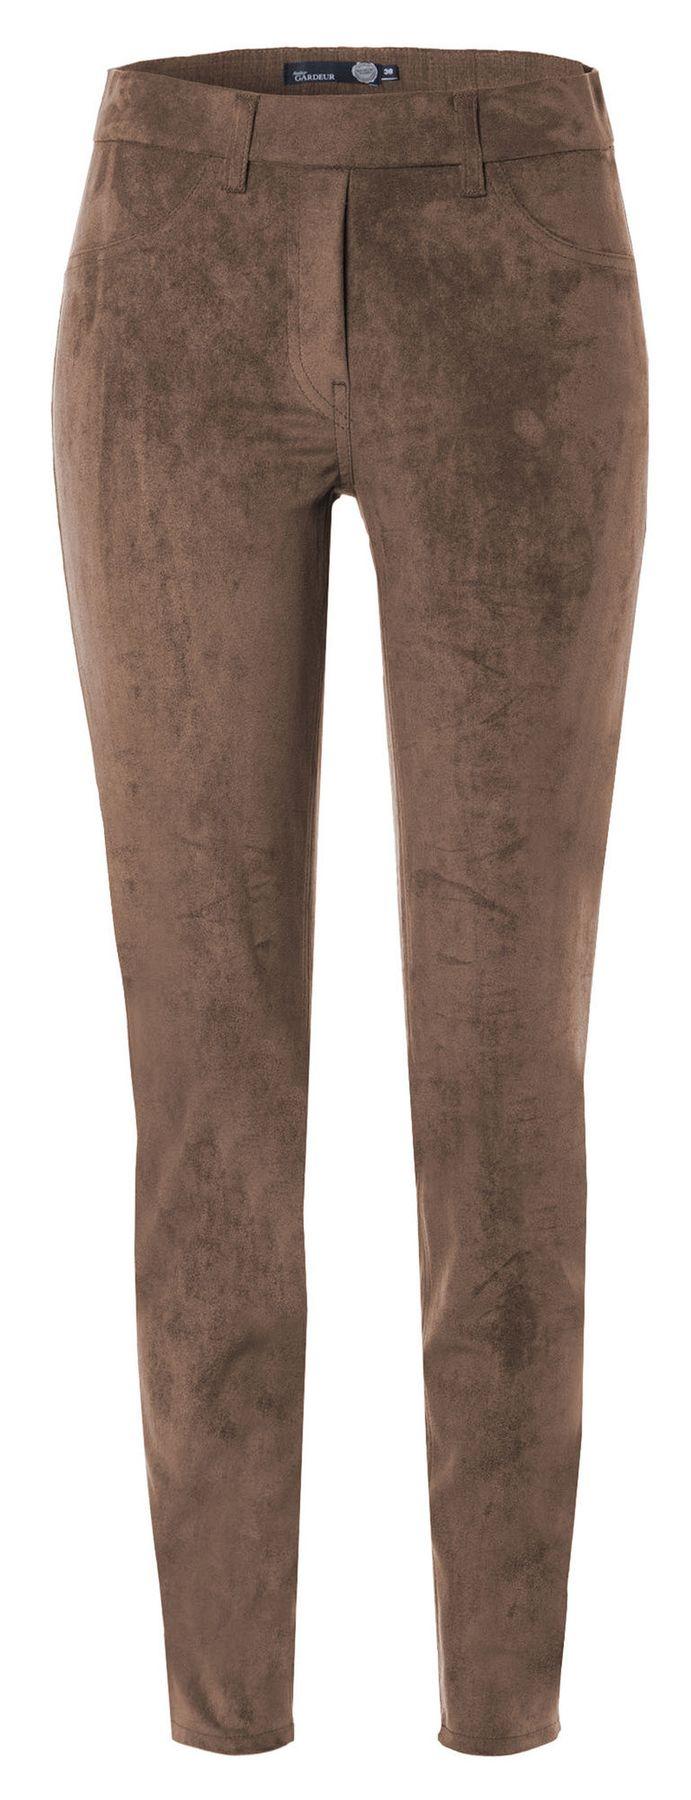 Atelier Gardeur - Modern Fit - Slip On Damenhose in Velourslederoptik Zeggi4 (600711) – Bild 4